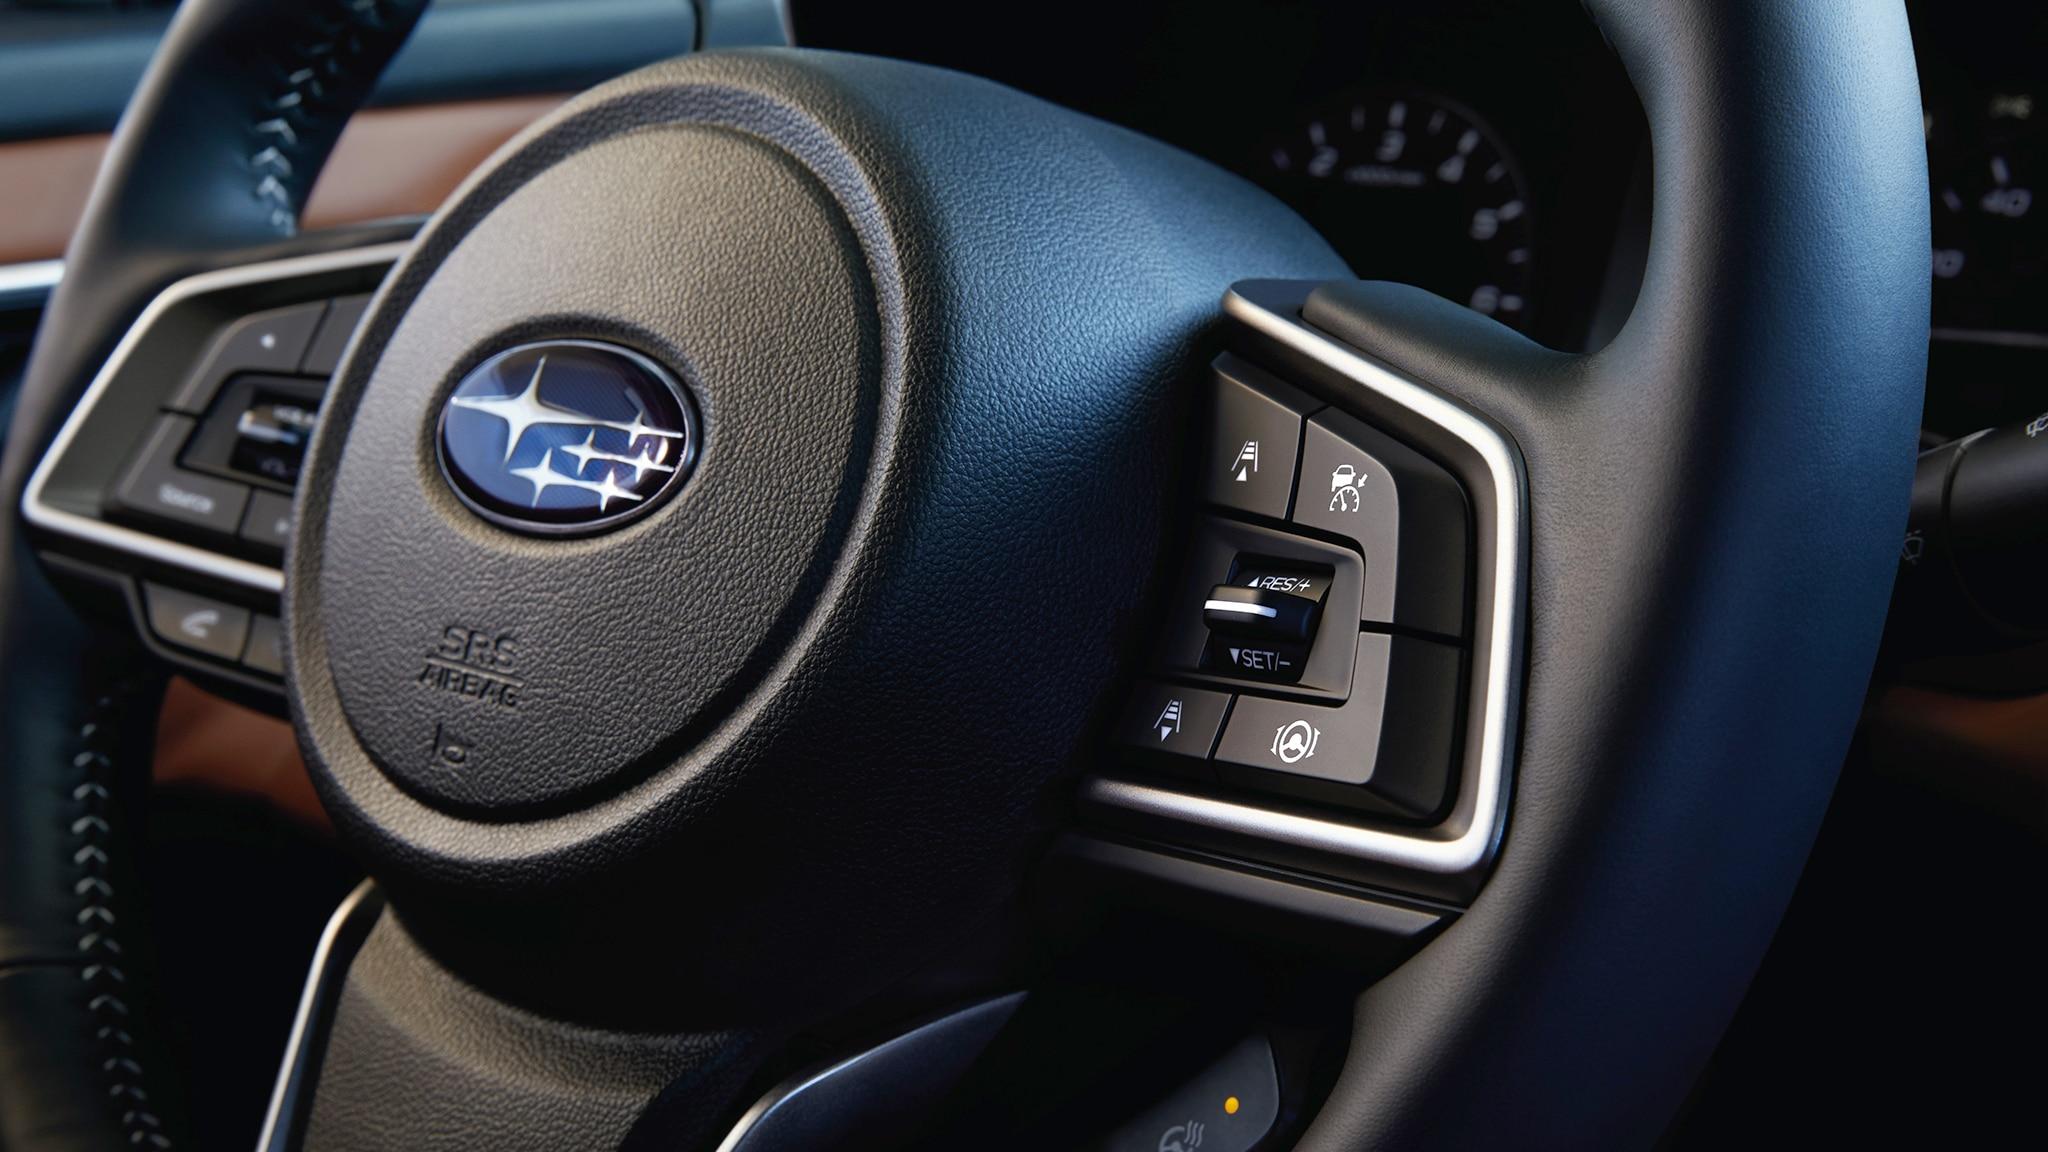 2020 Subaru Legacy Photos And Info: New Platform And New